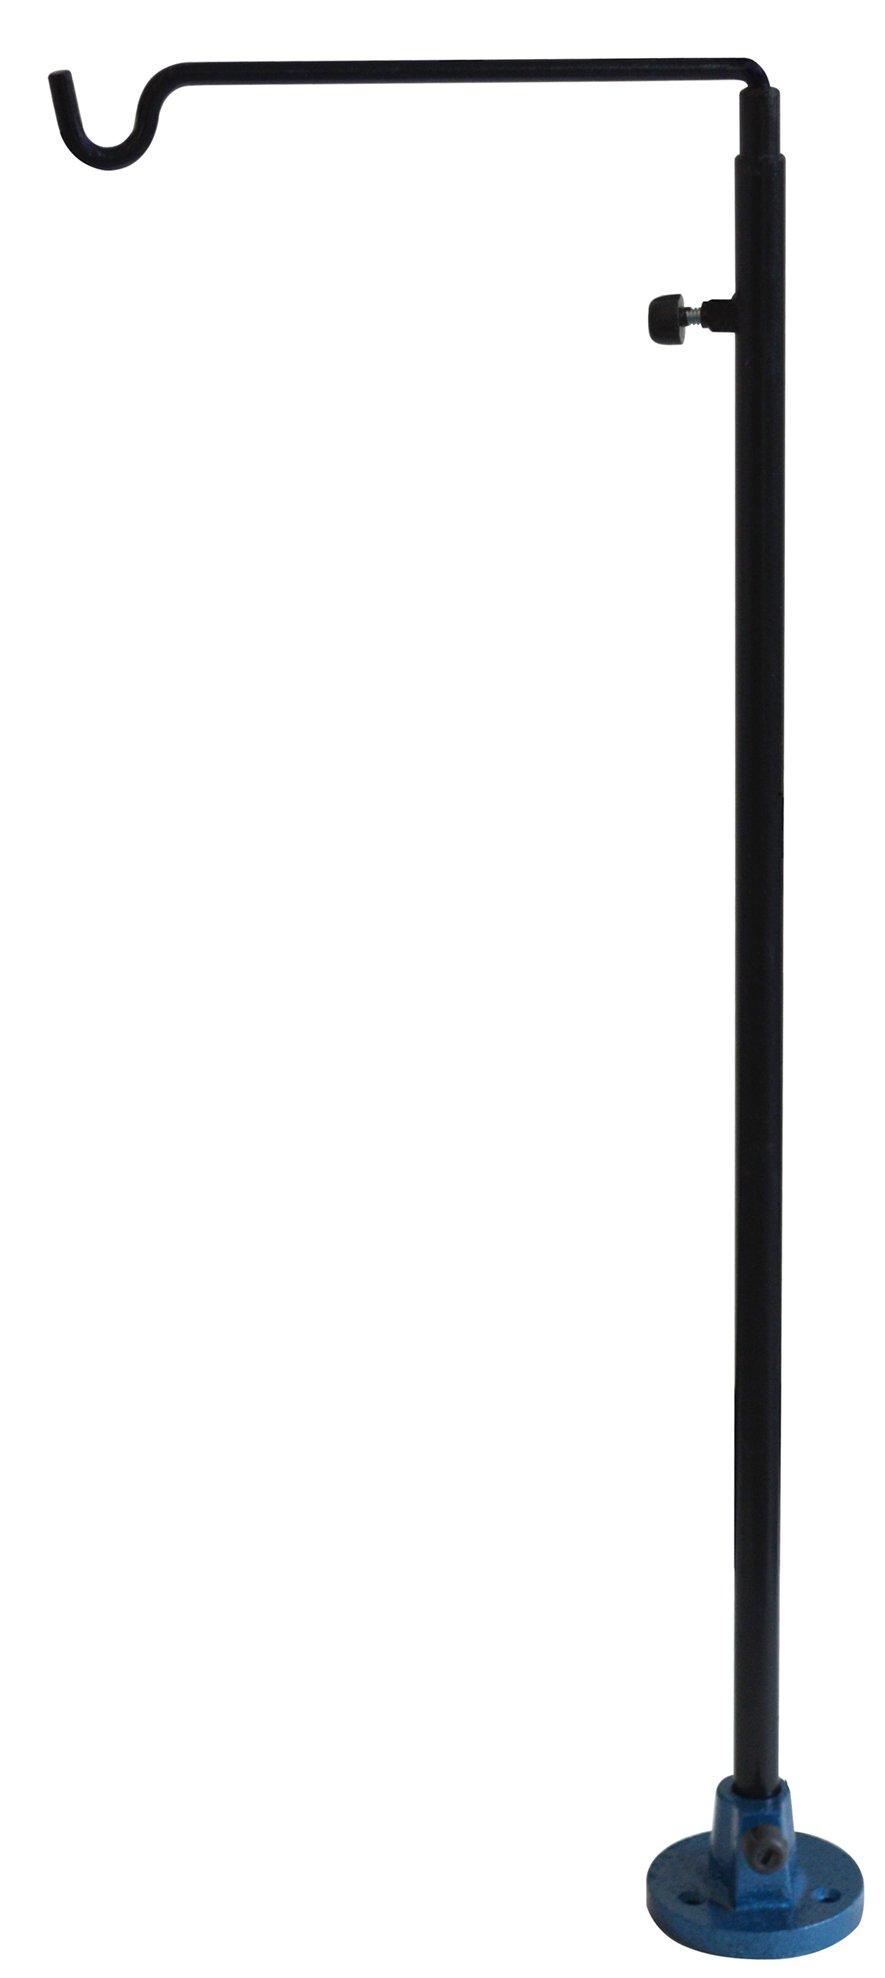 Adjustable Flex Shaft Hanger - 26'' to 41'' Jewelry Making Flexible Shaft Machine Motor Holder Bench Tool